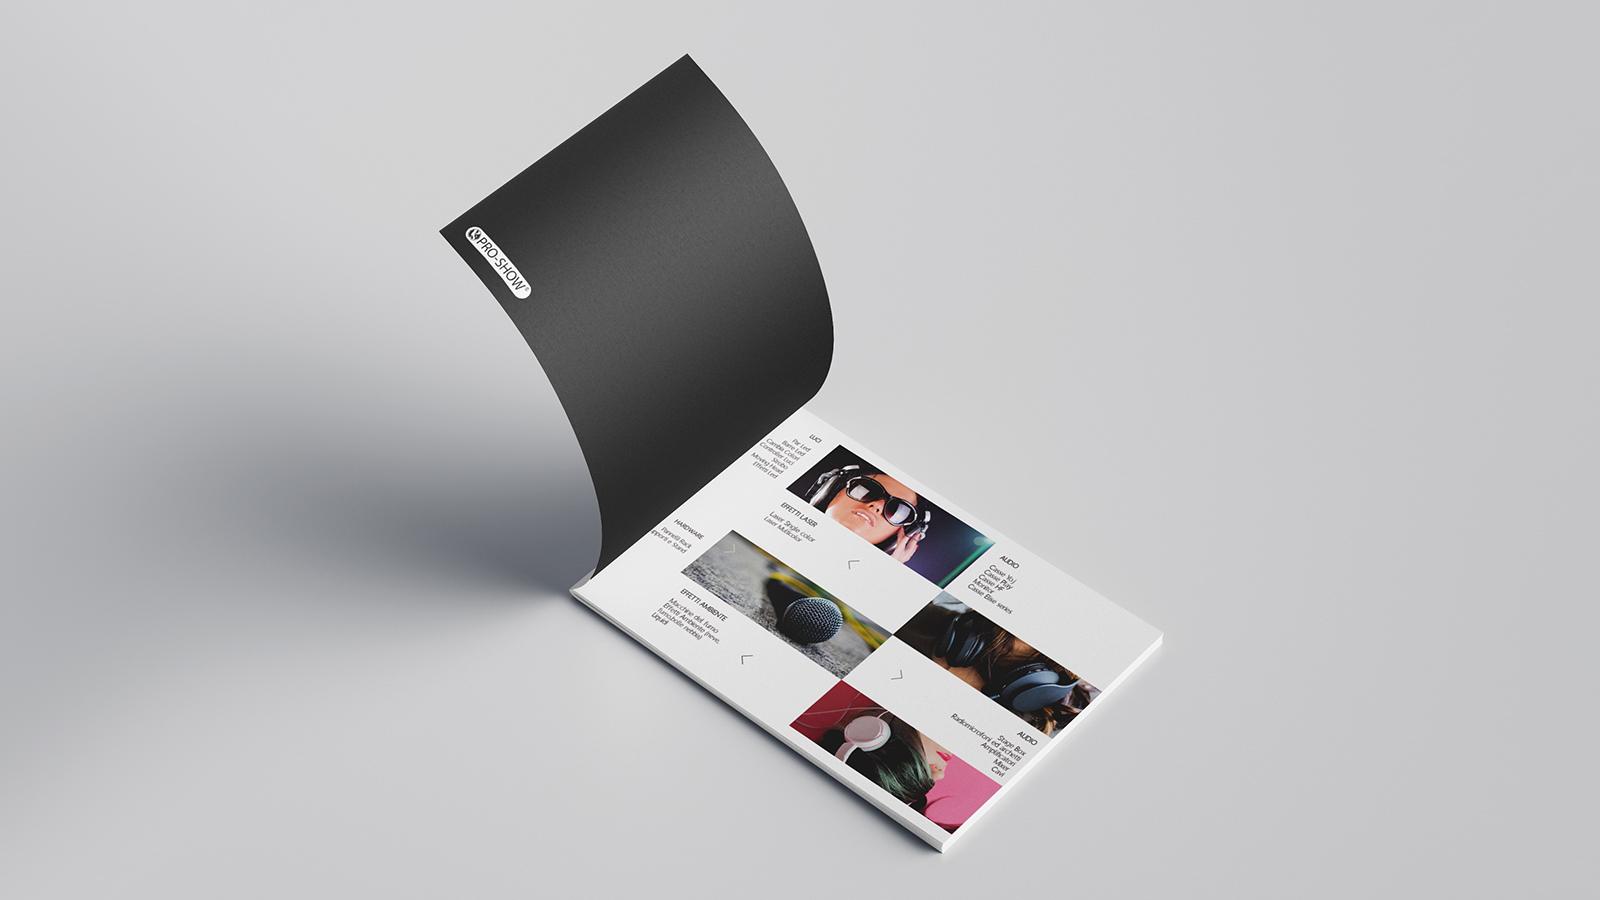 https://www.elisadellachiesa.it/wp-content/uploads/2020/01/Catalogo-Pro-Show-mock-up-3-LOW.jpg